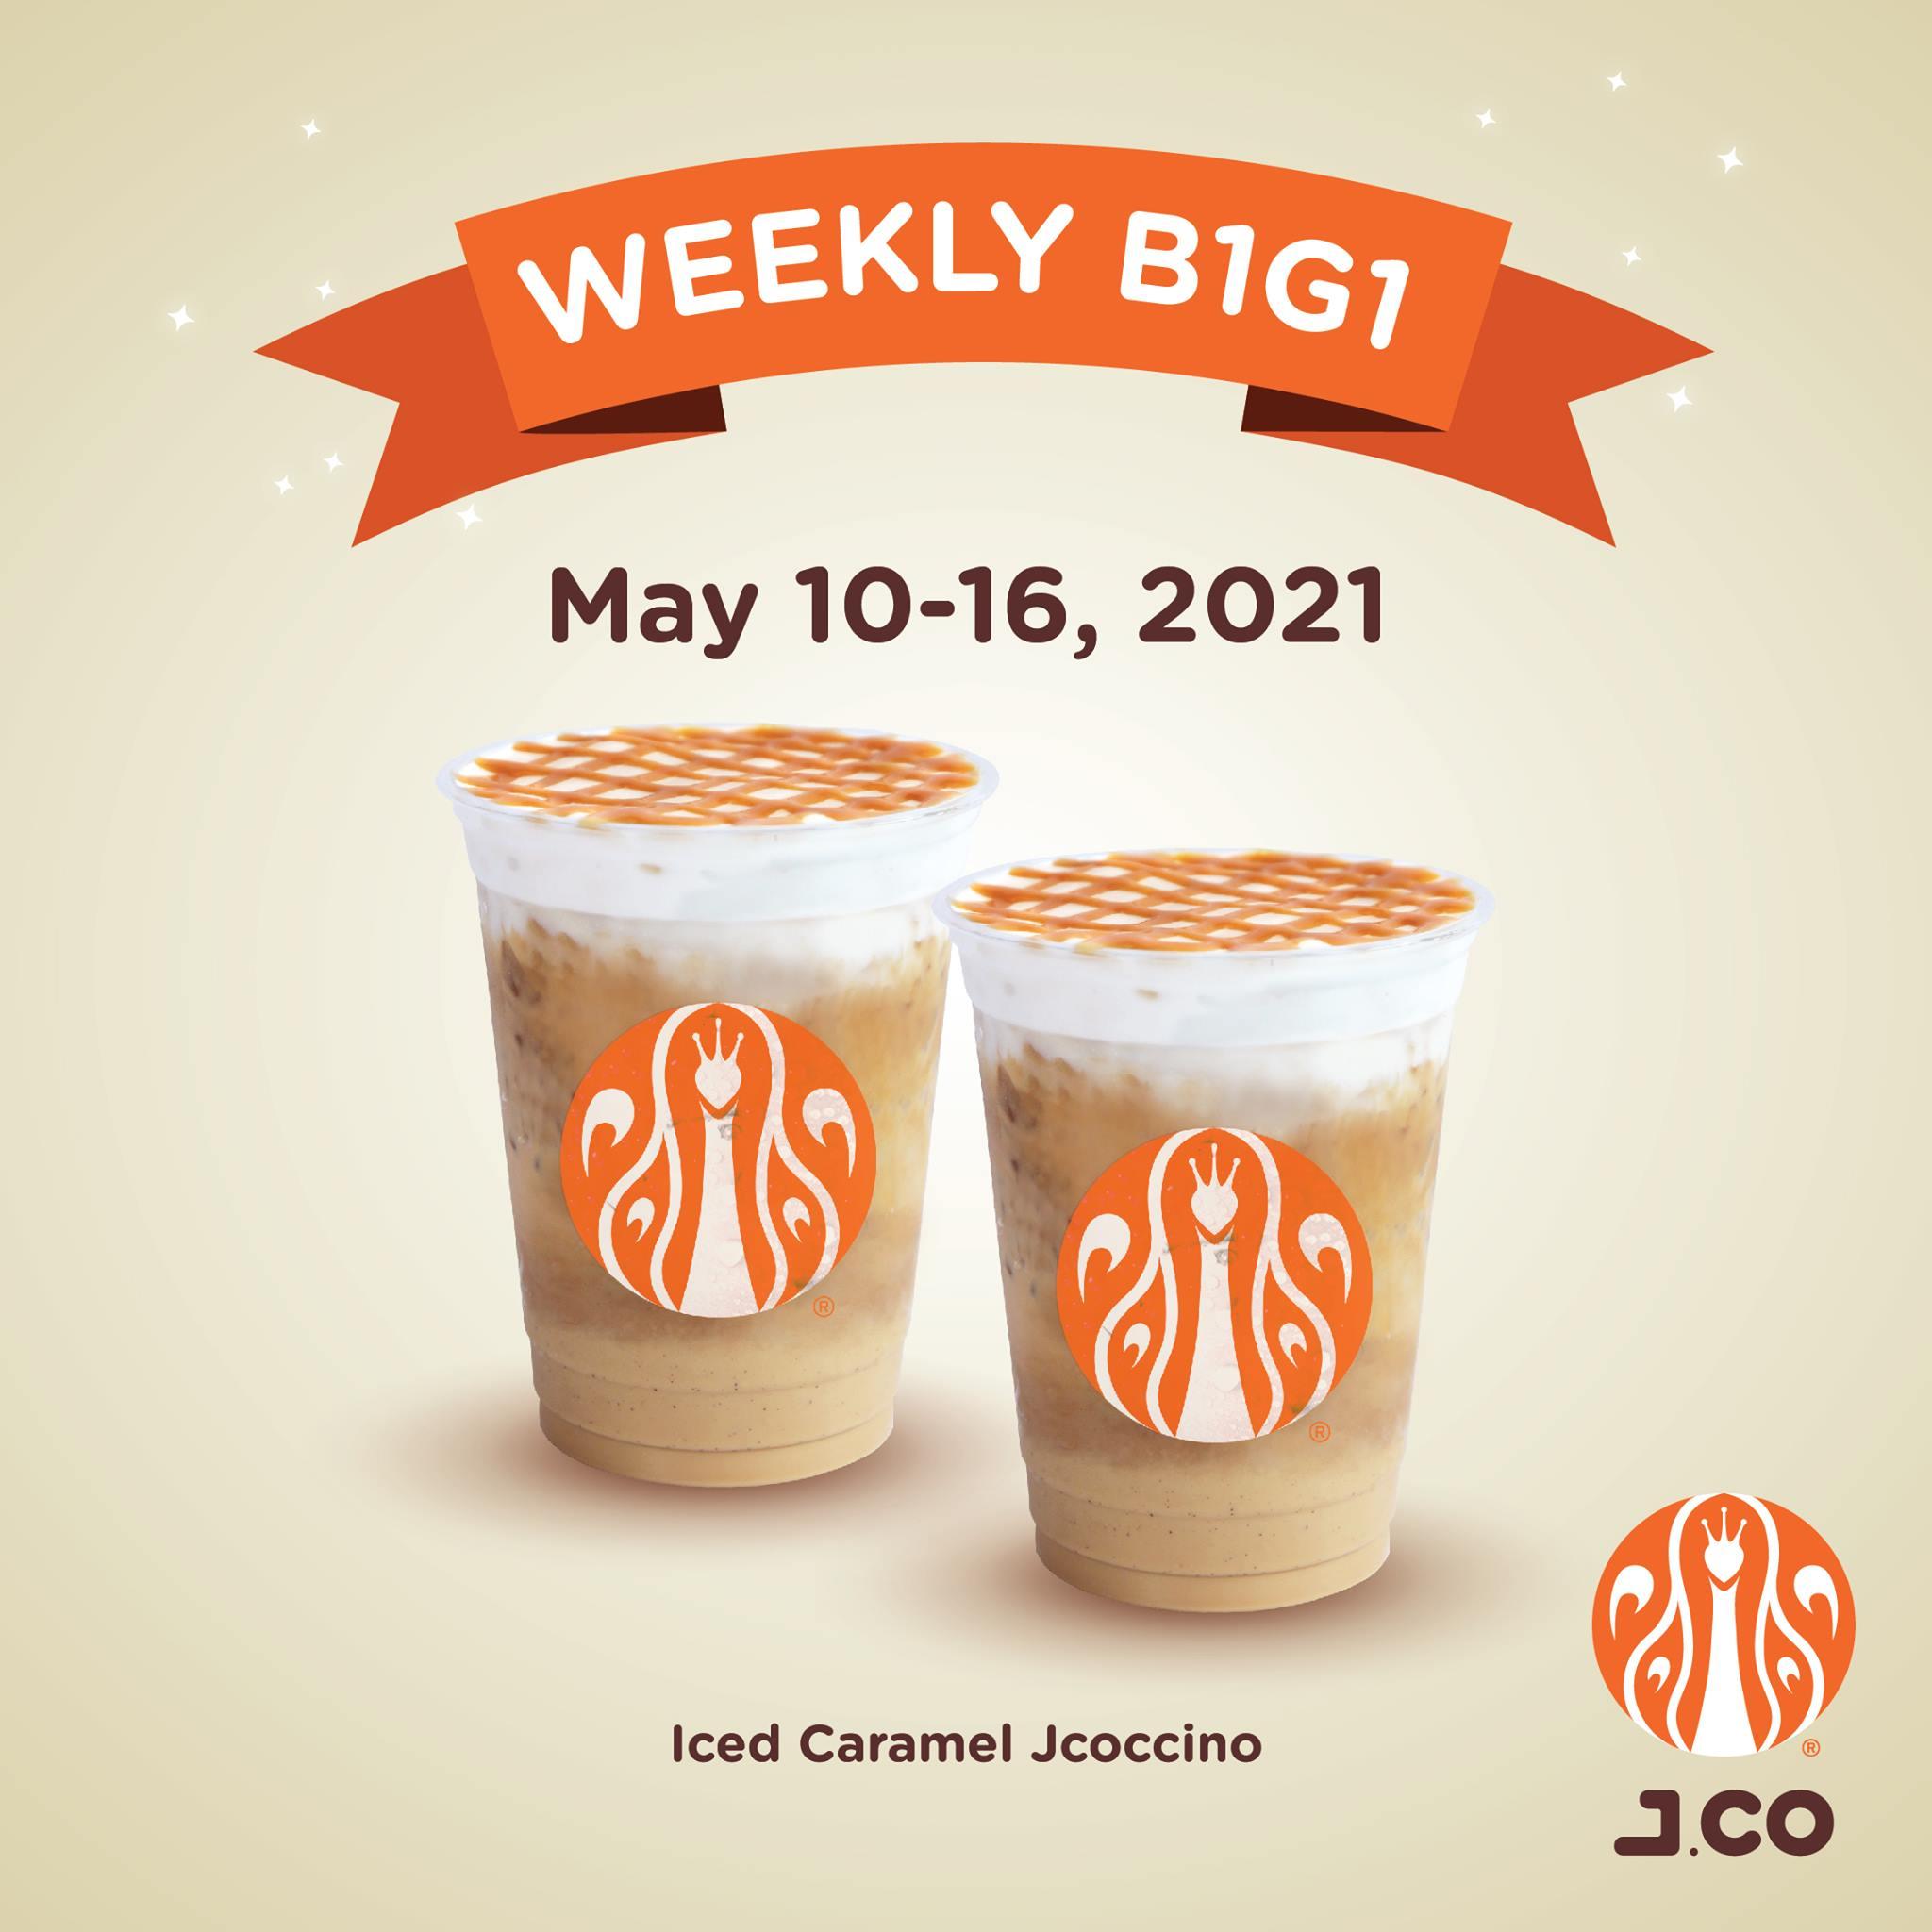 J.CO Weekly Promo May 2021 Ice Caramel Jcoccino